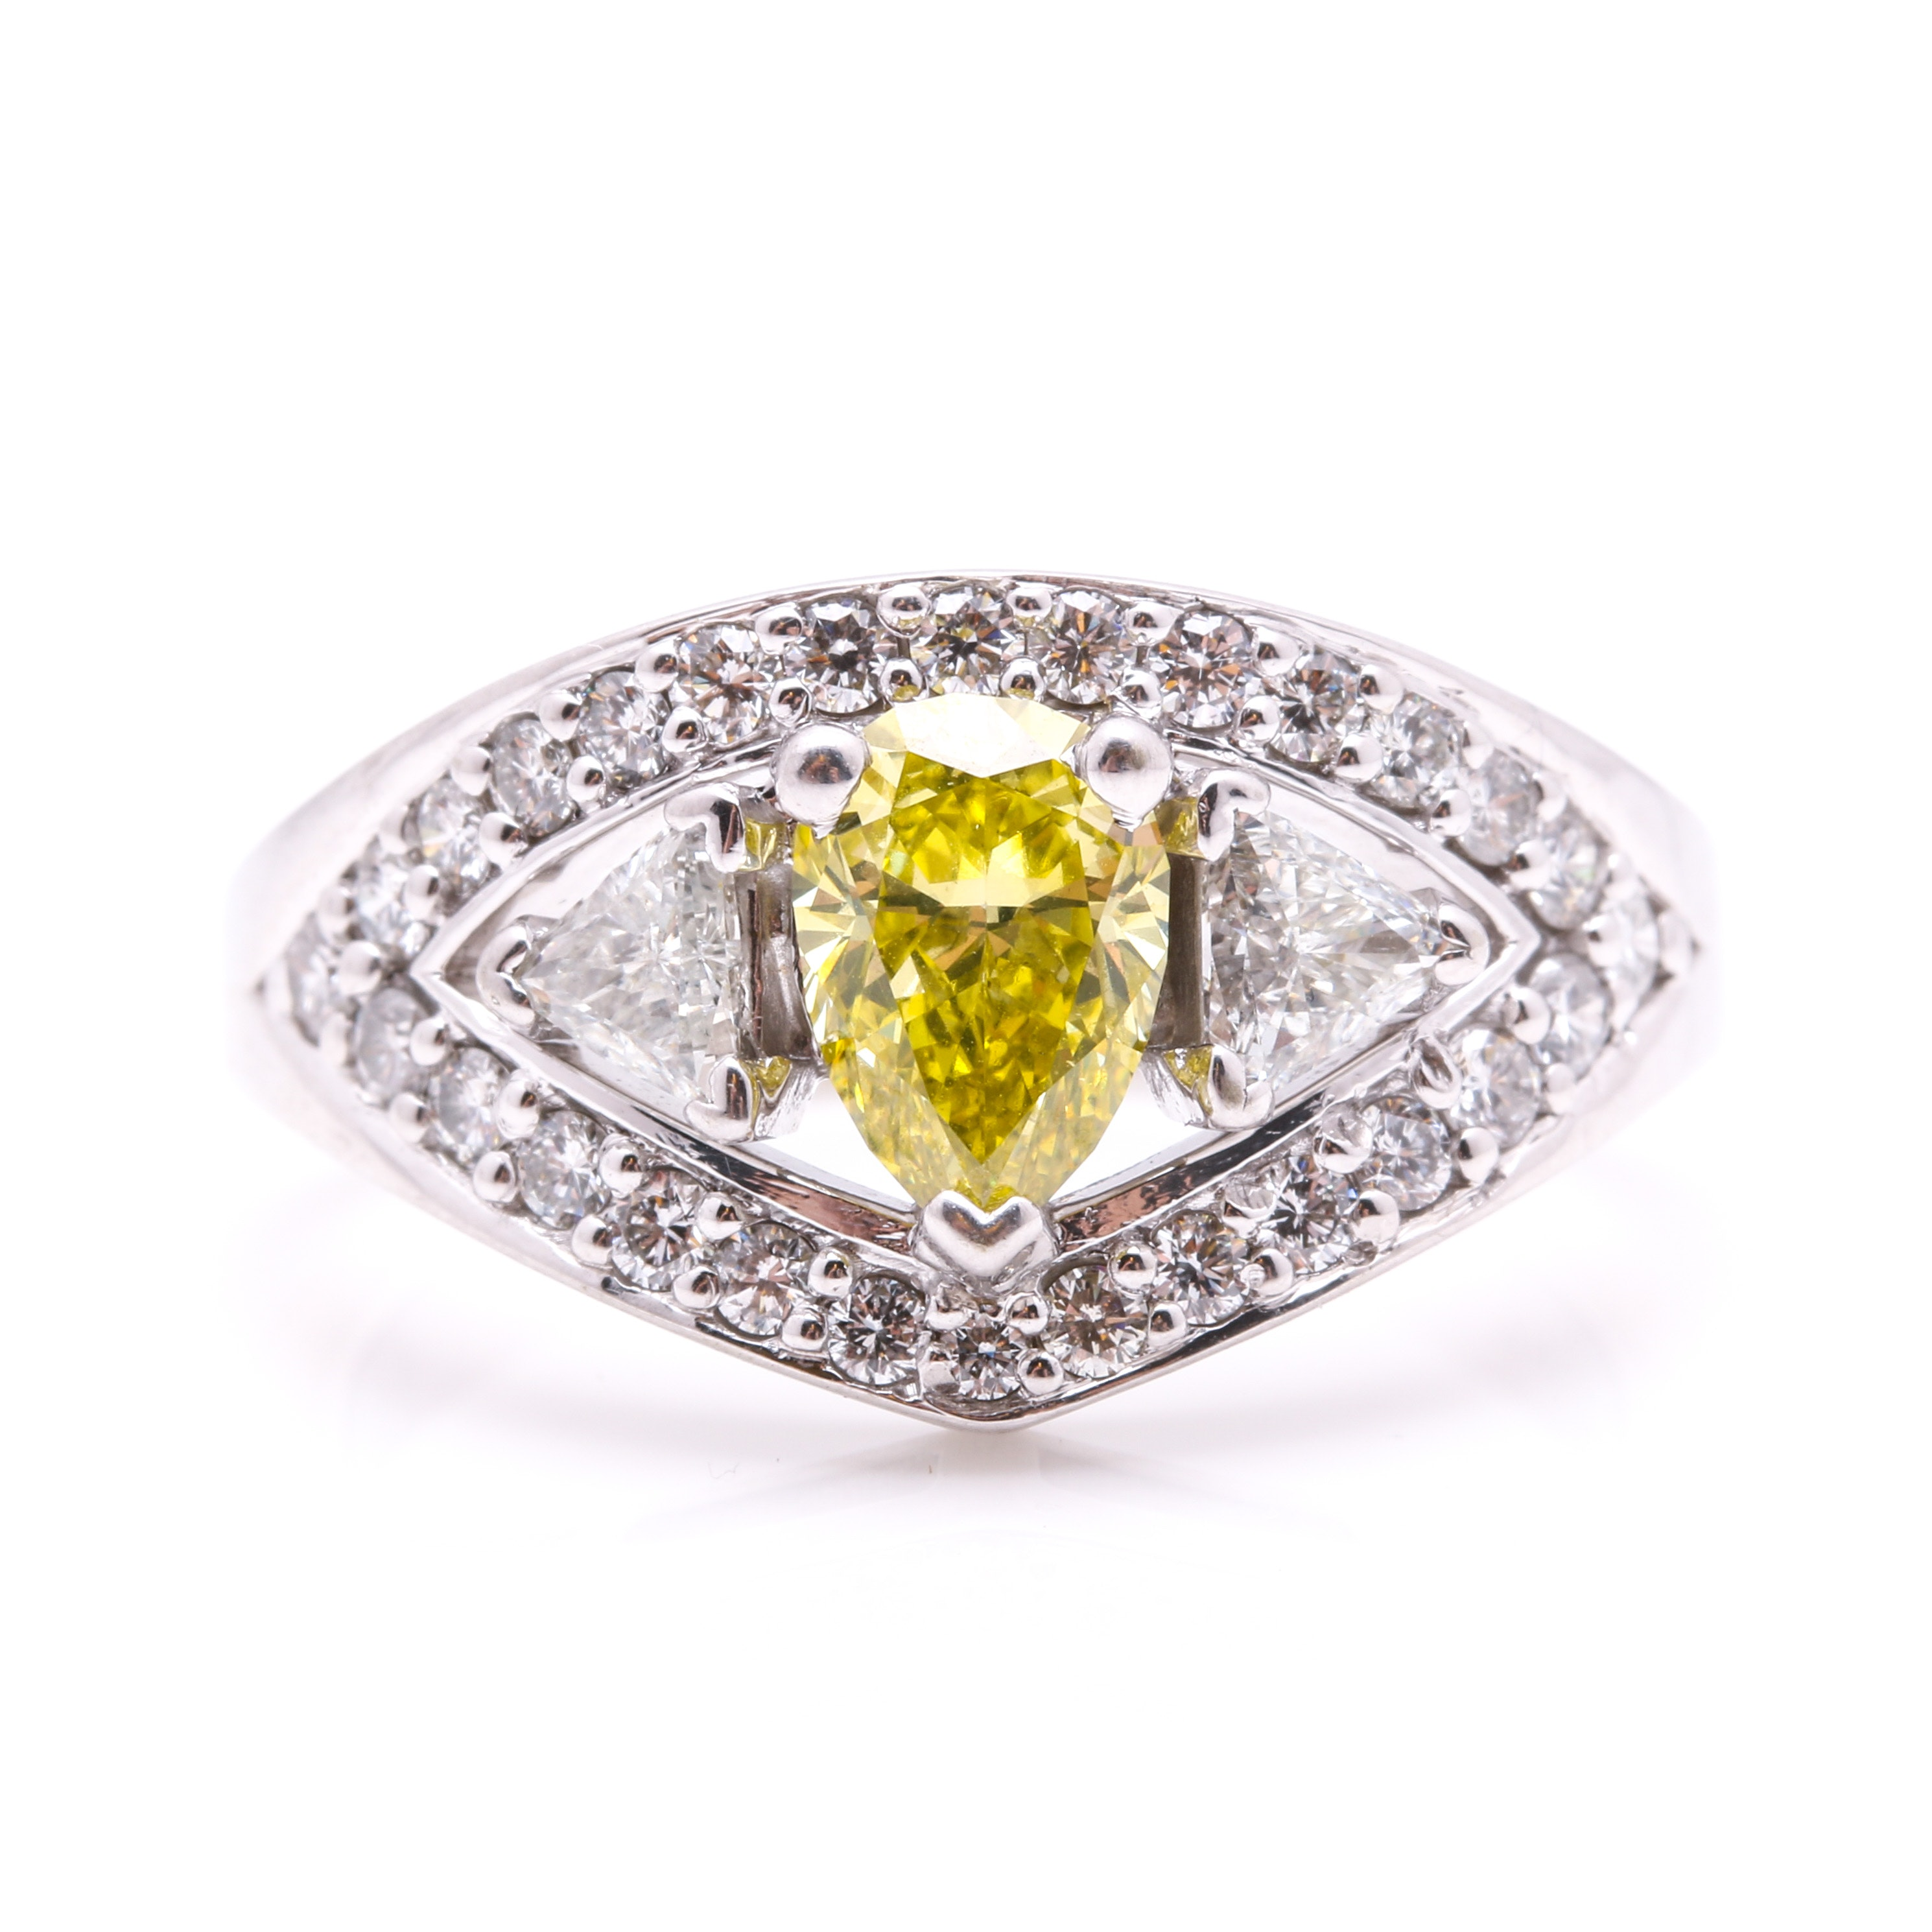 14K White Gold 1.53 CTW Diamond Ring